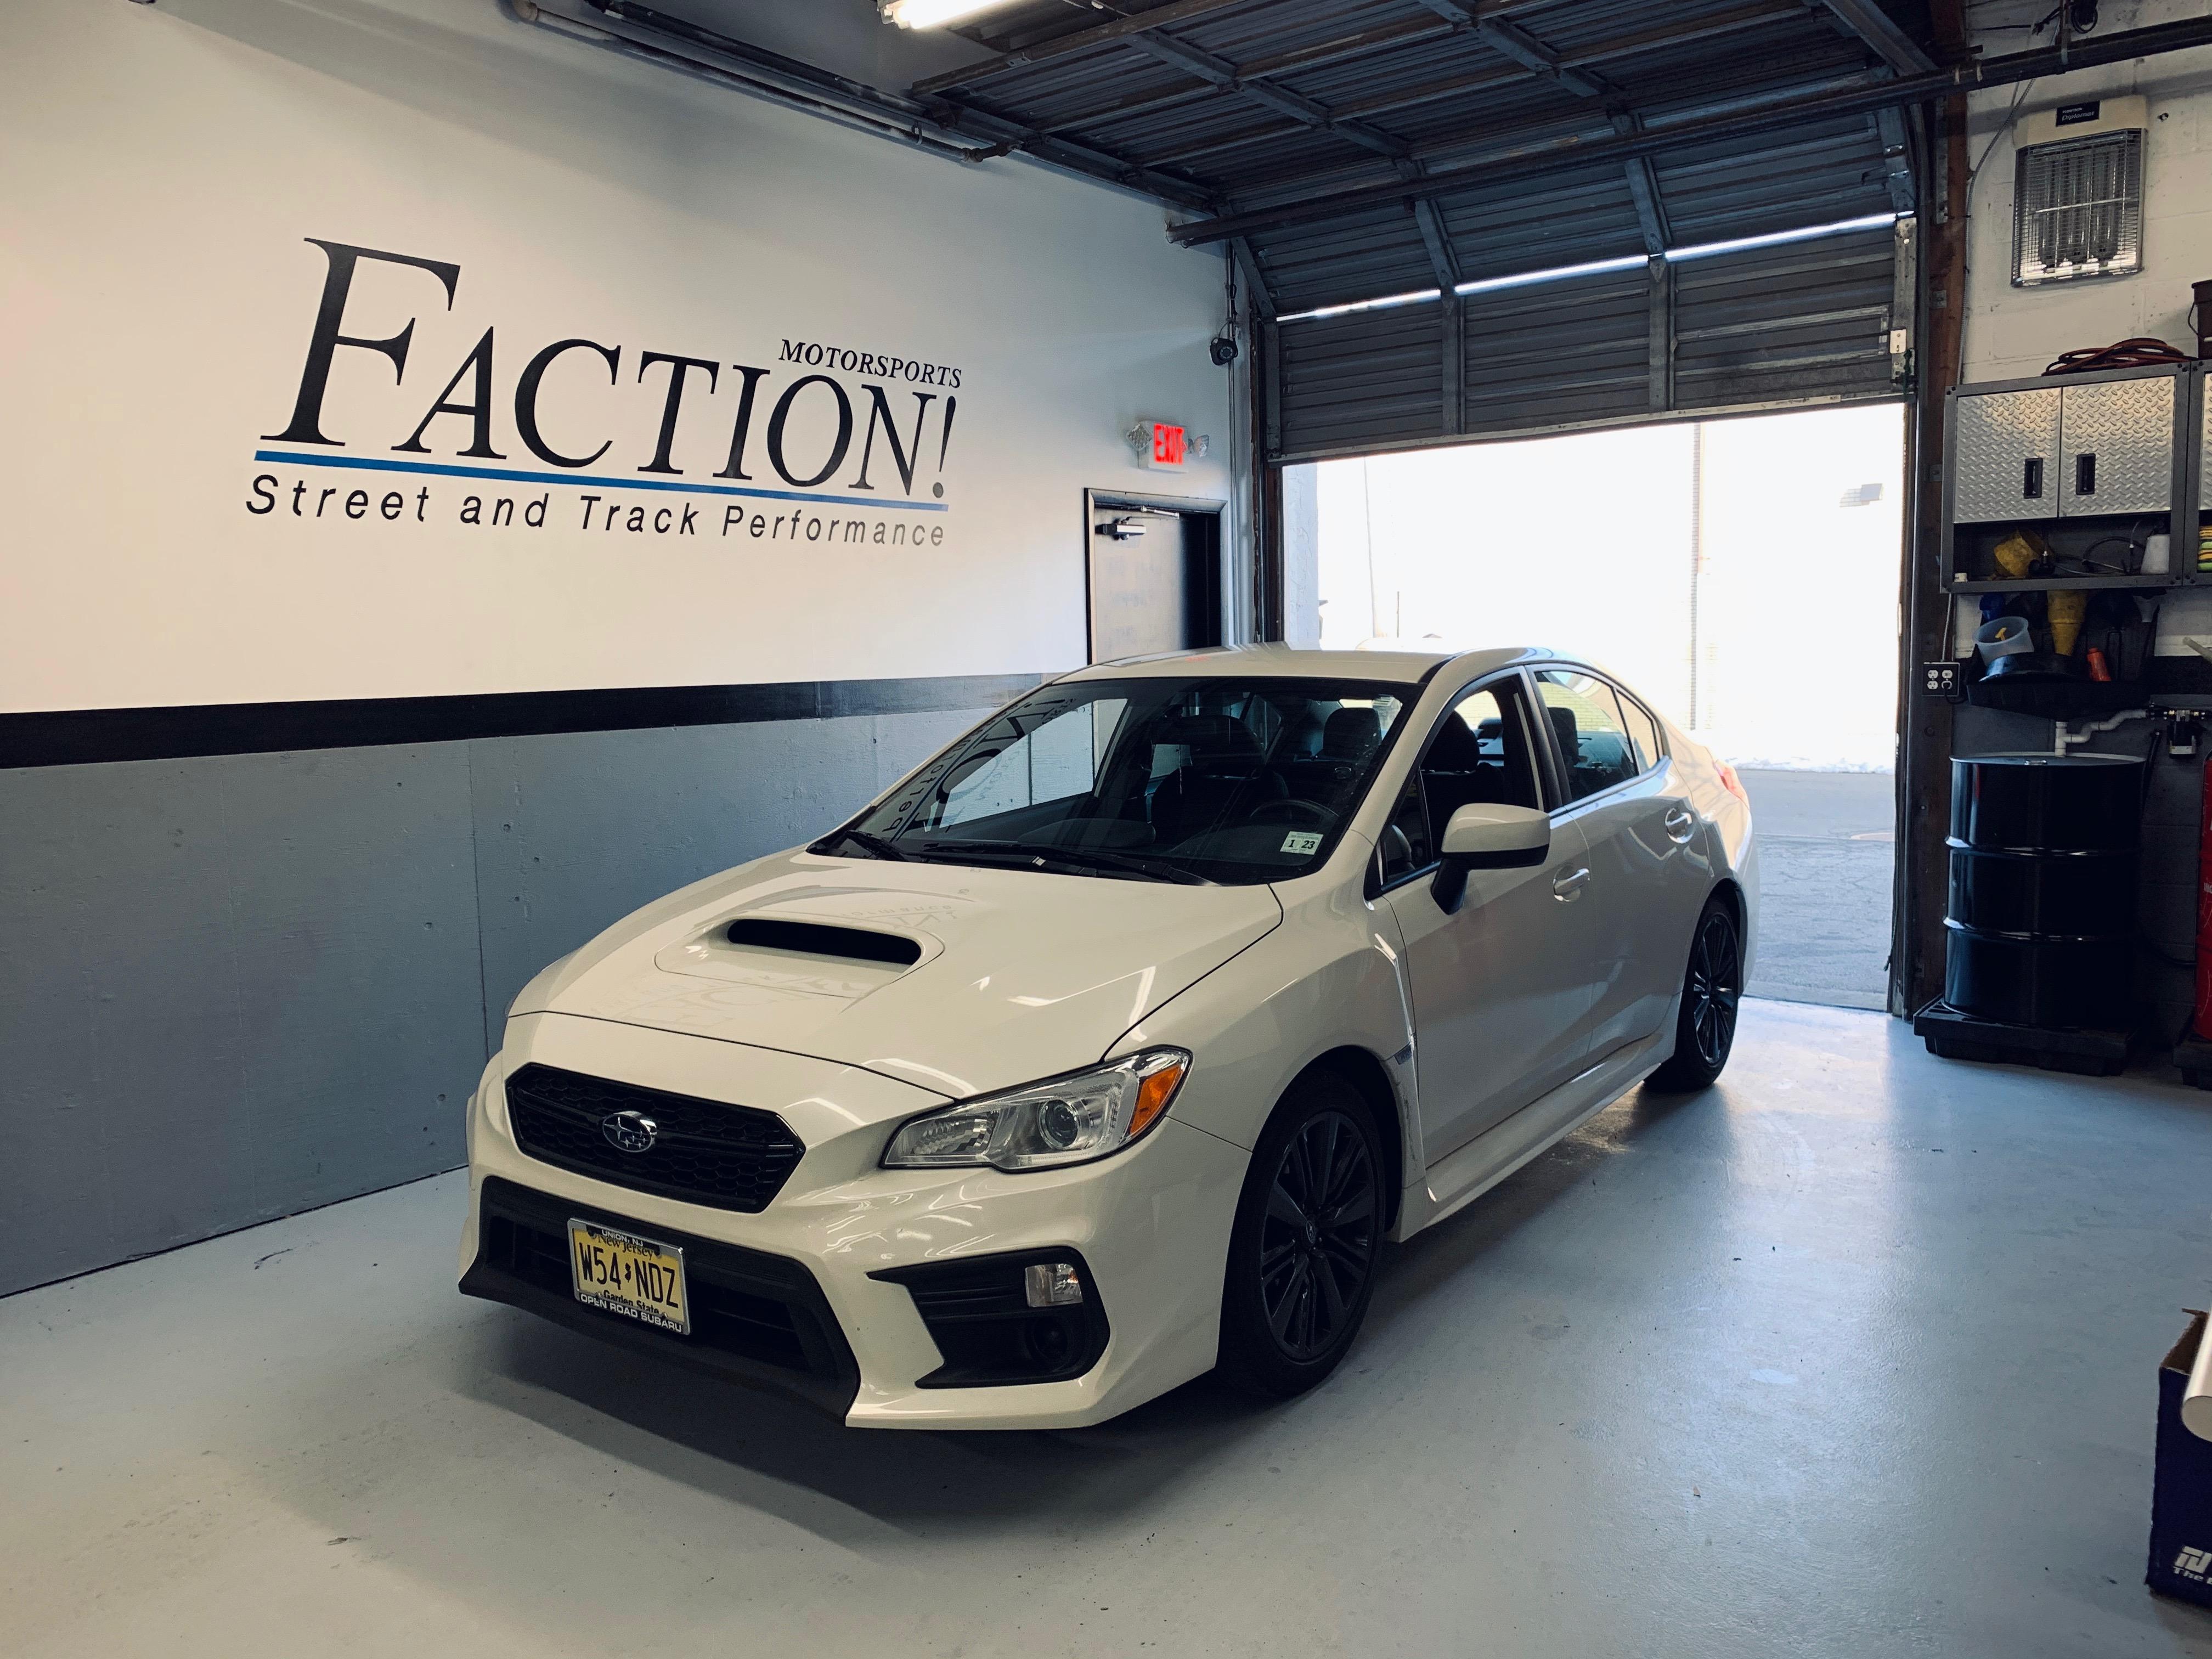 Faction Motorsports 27B Poplar St East Rutherford, NJ 07073